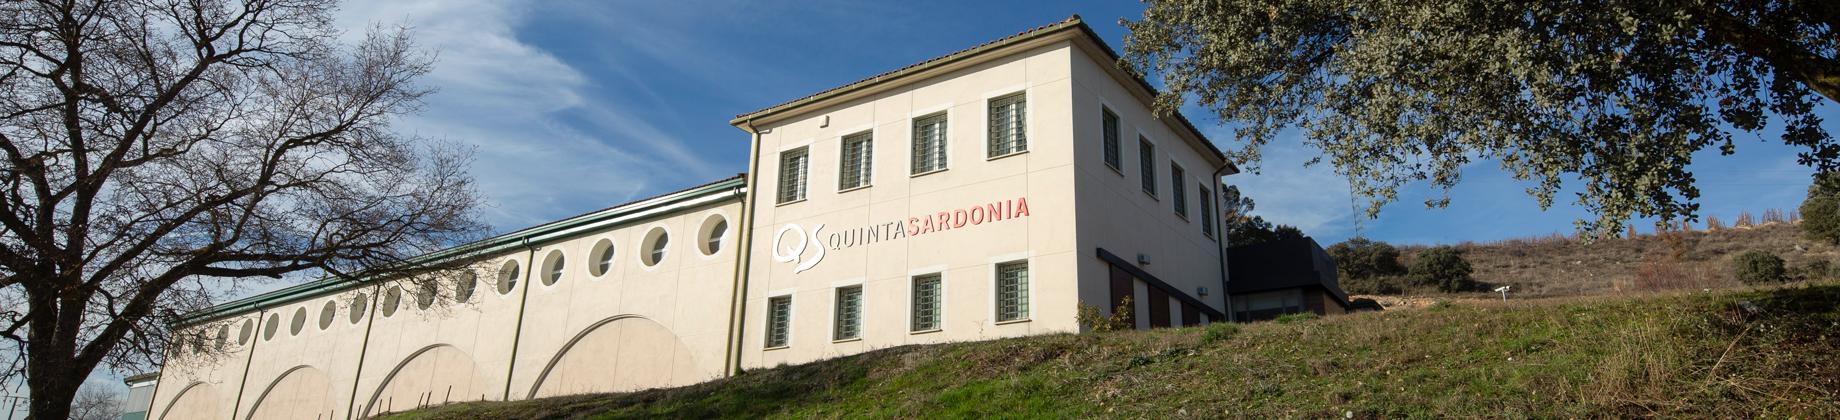 Visita Quinta Sardonia